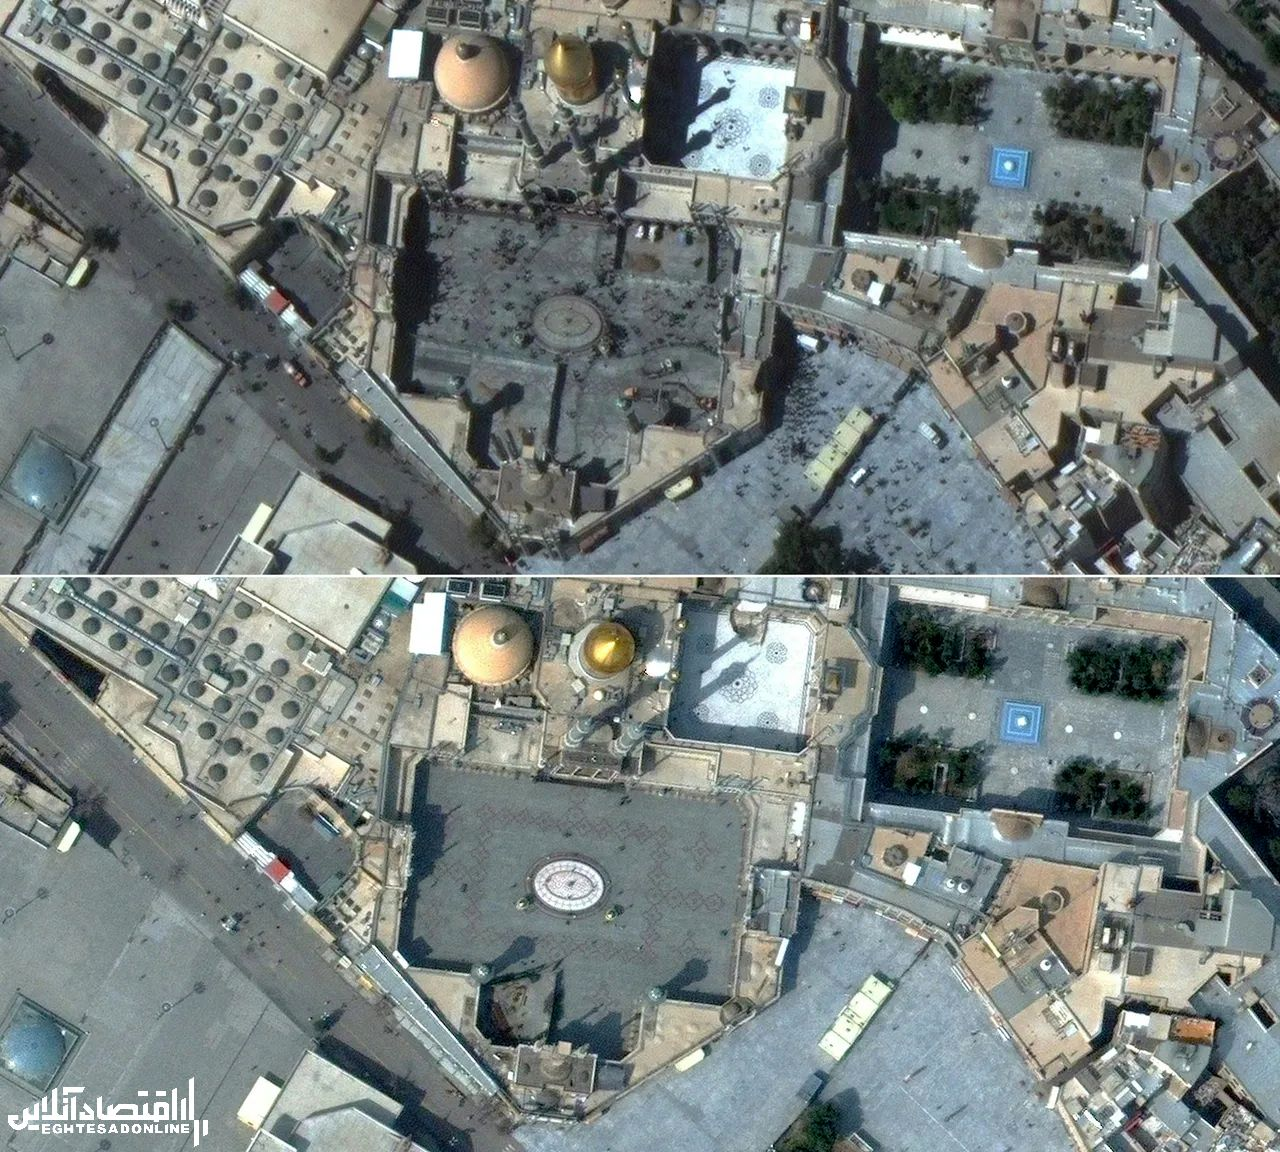 Satellite images show the impact of coronavirus